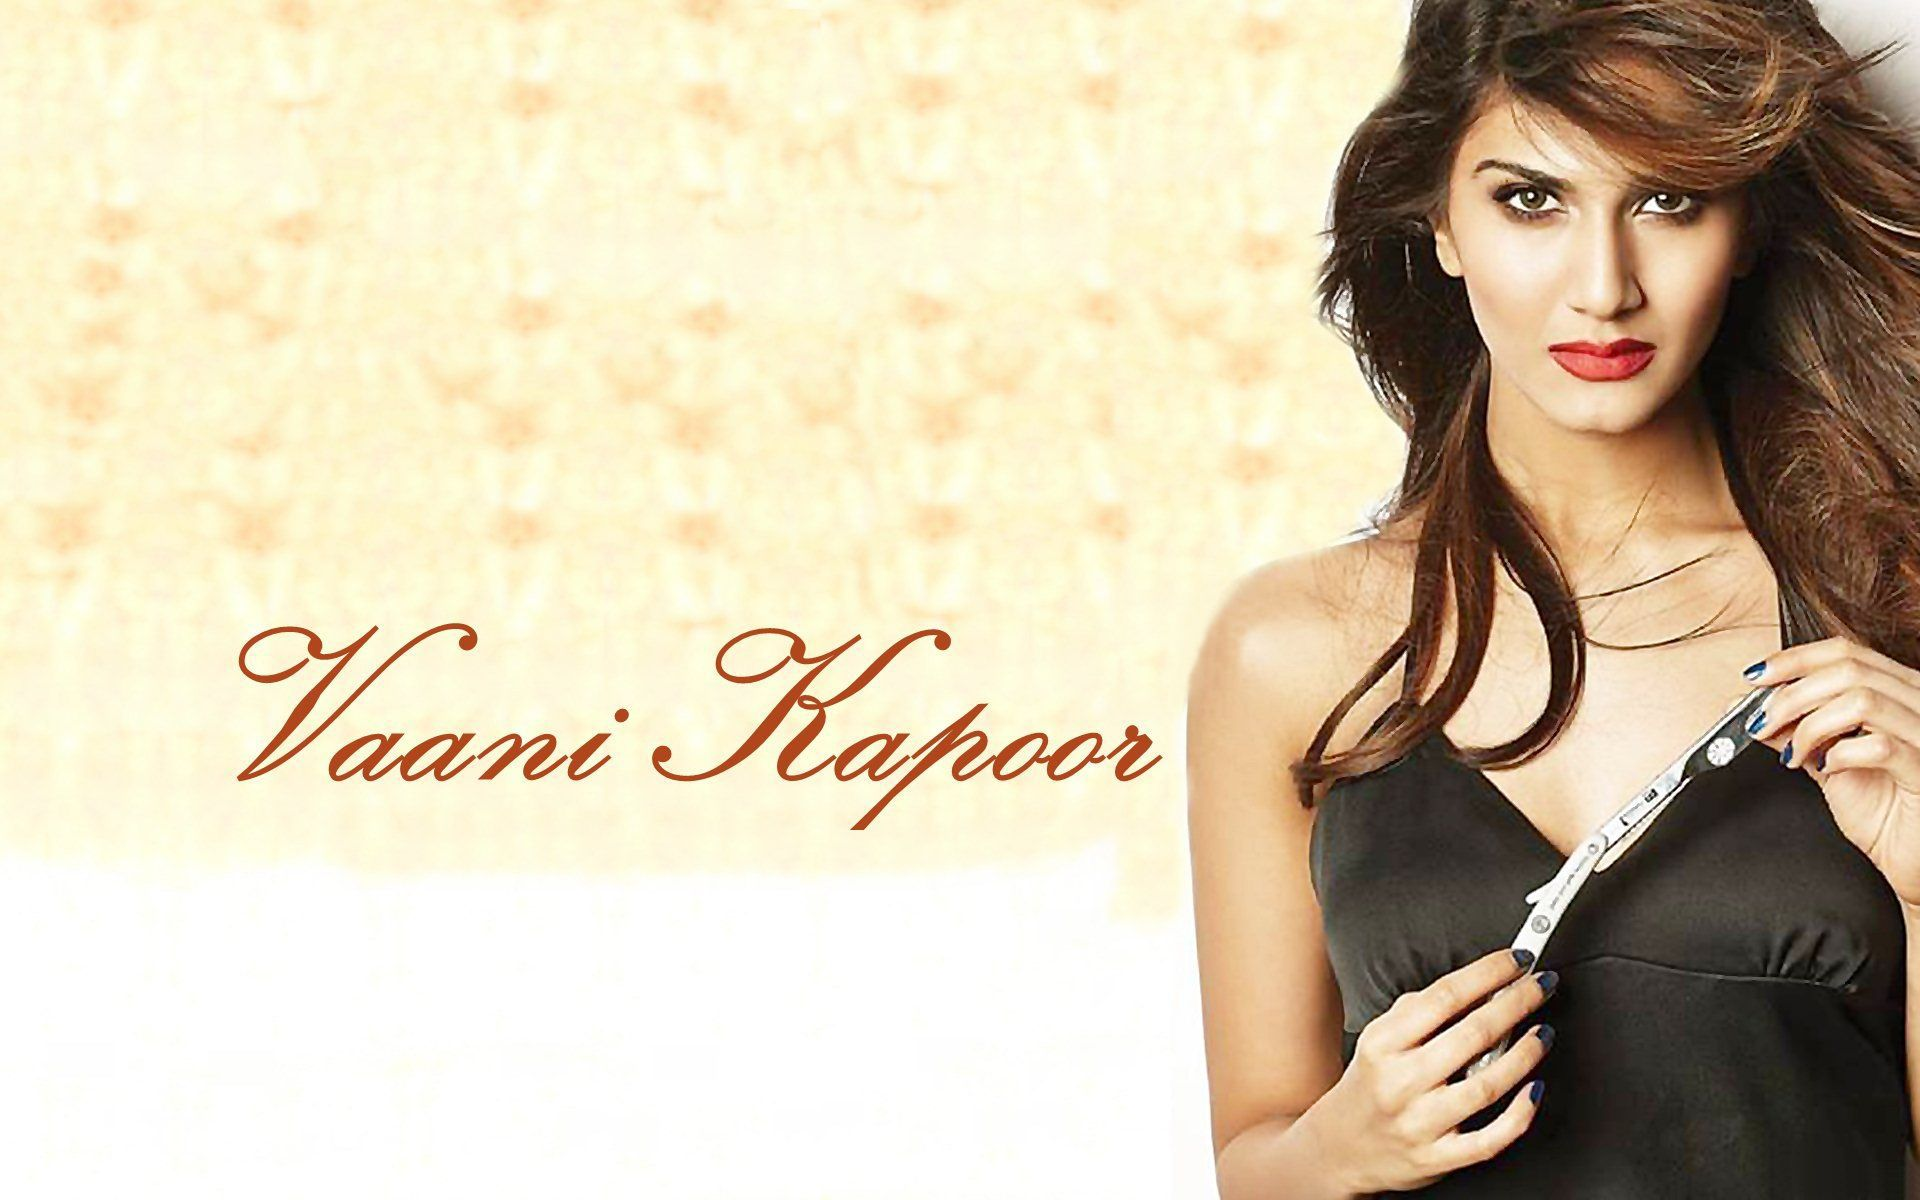 vaani kapoor Wallpapers Hot and Vaani Kapoor